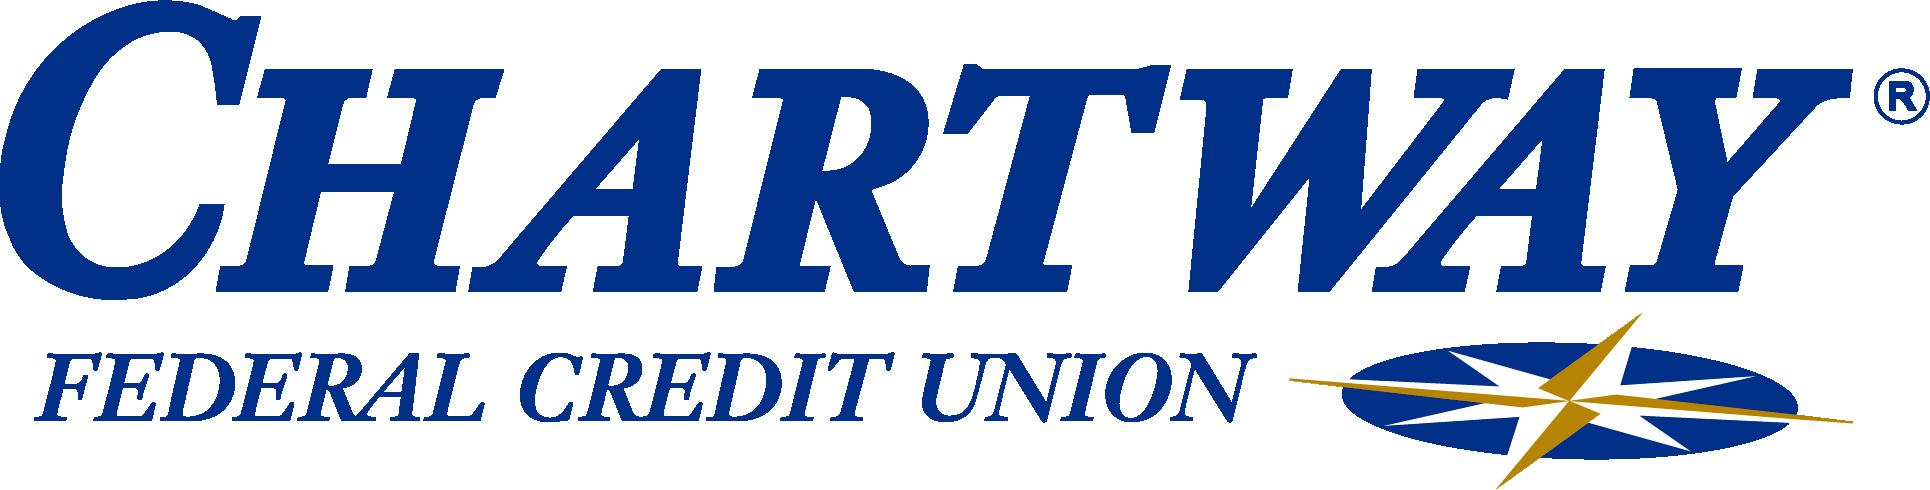 Chartway Federal Credit Union Company Logo